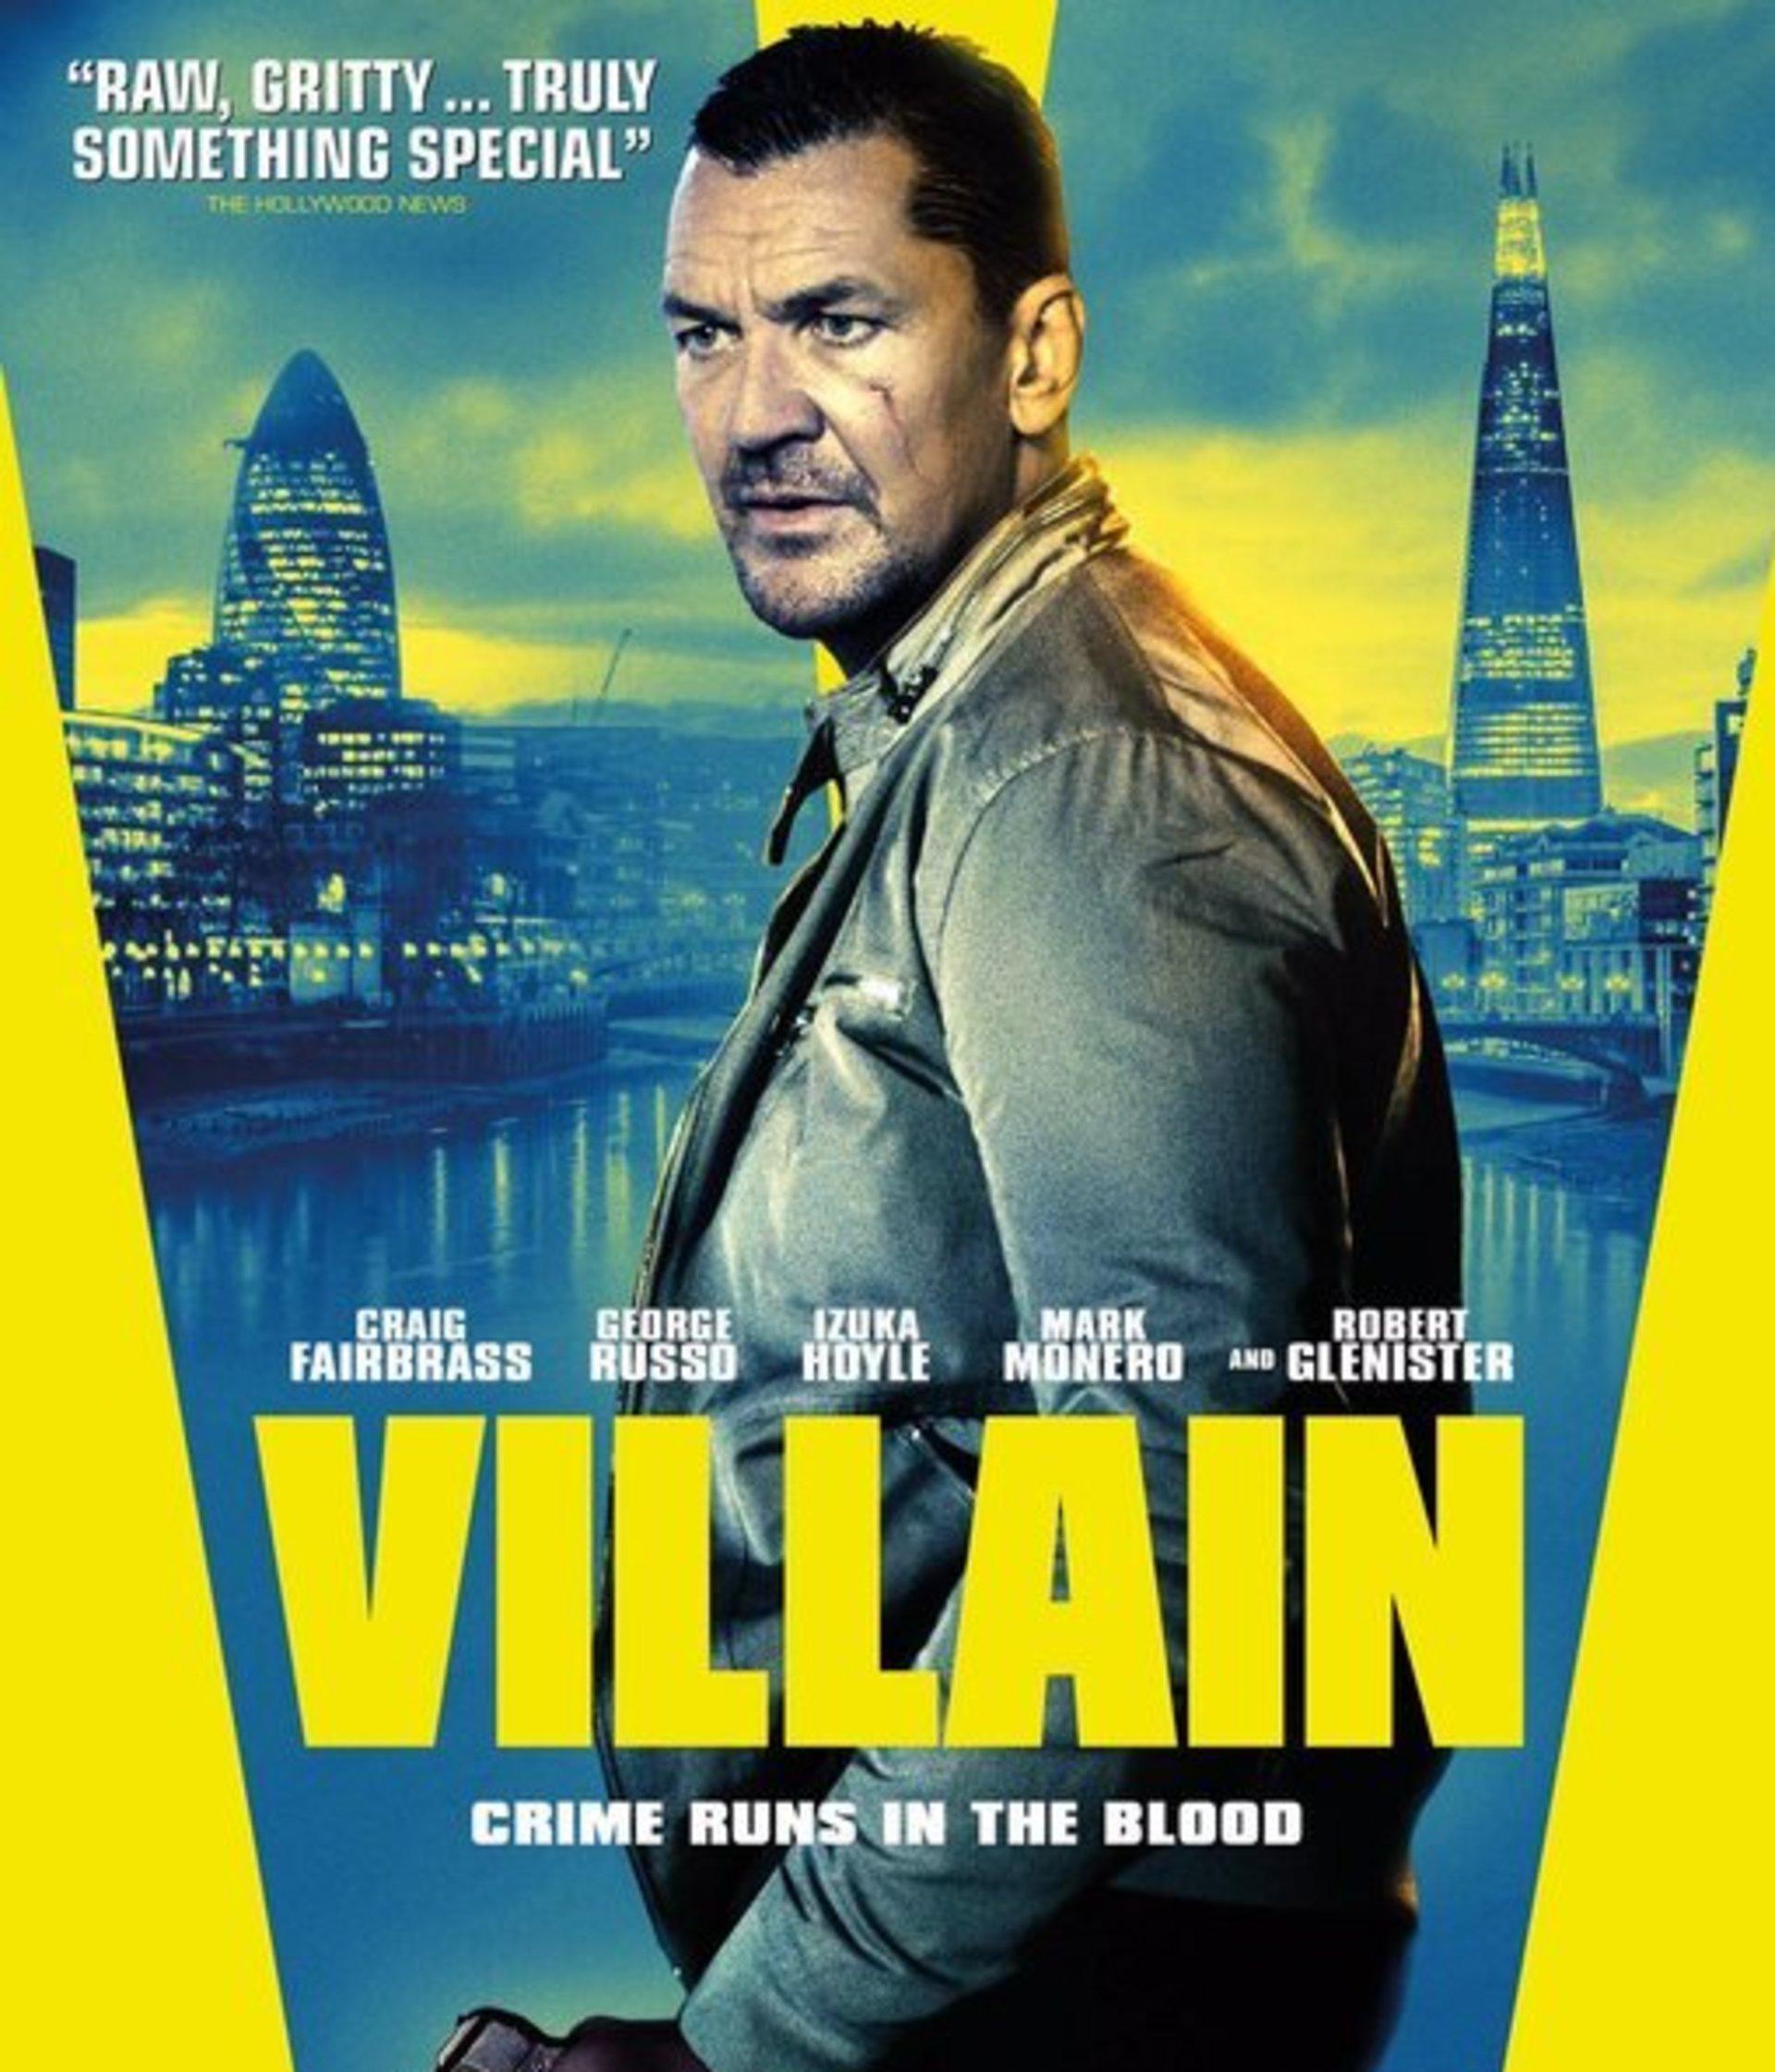 Nonton Film Villain (2020) Full Movie Sub Indo | Nonton ...